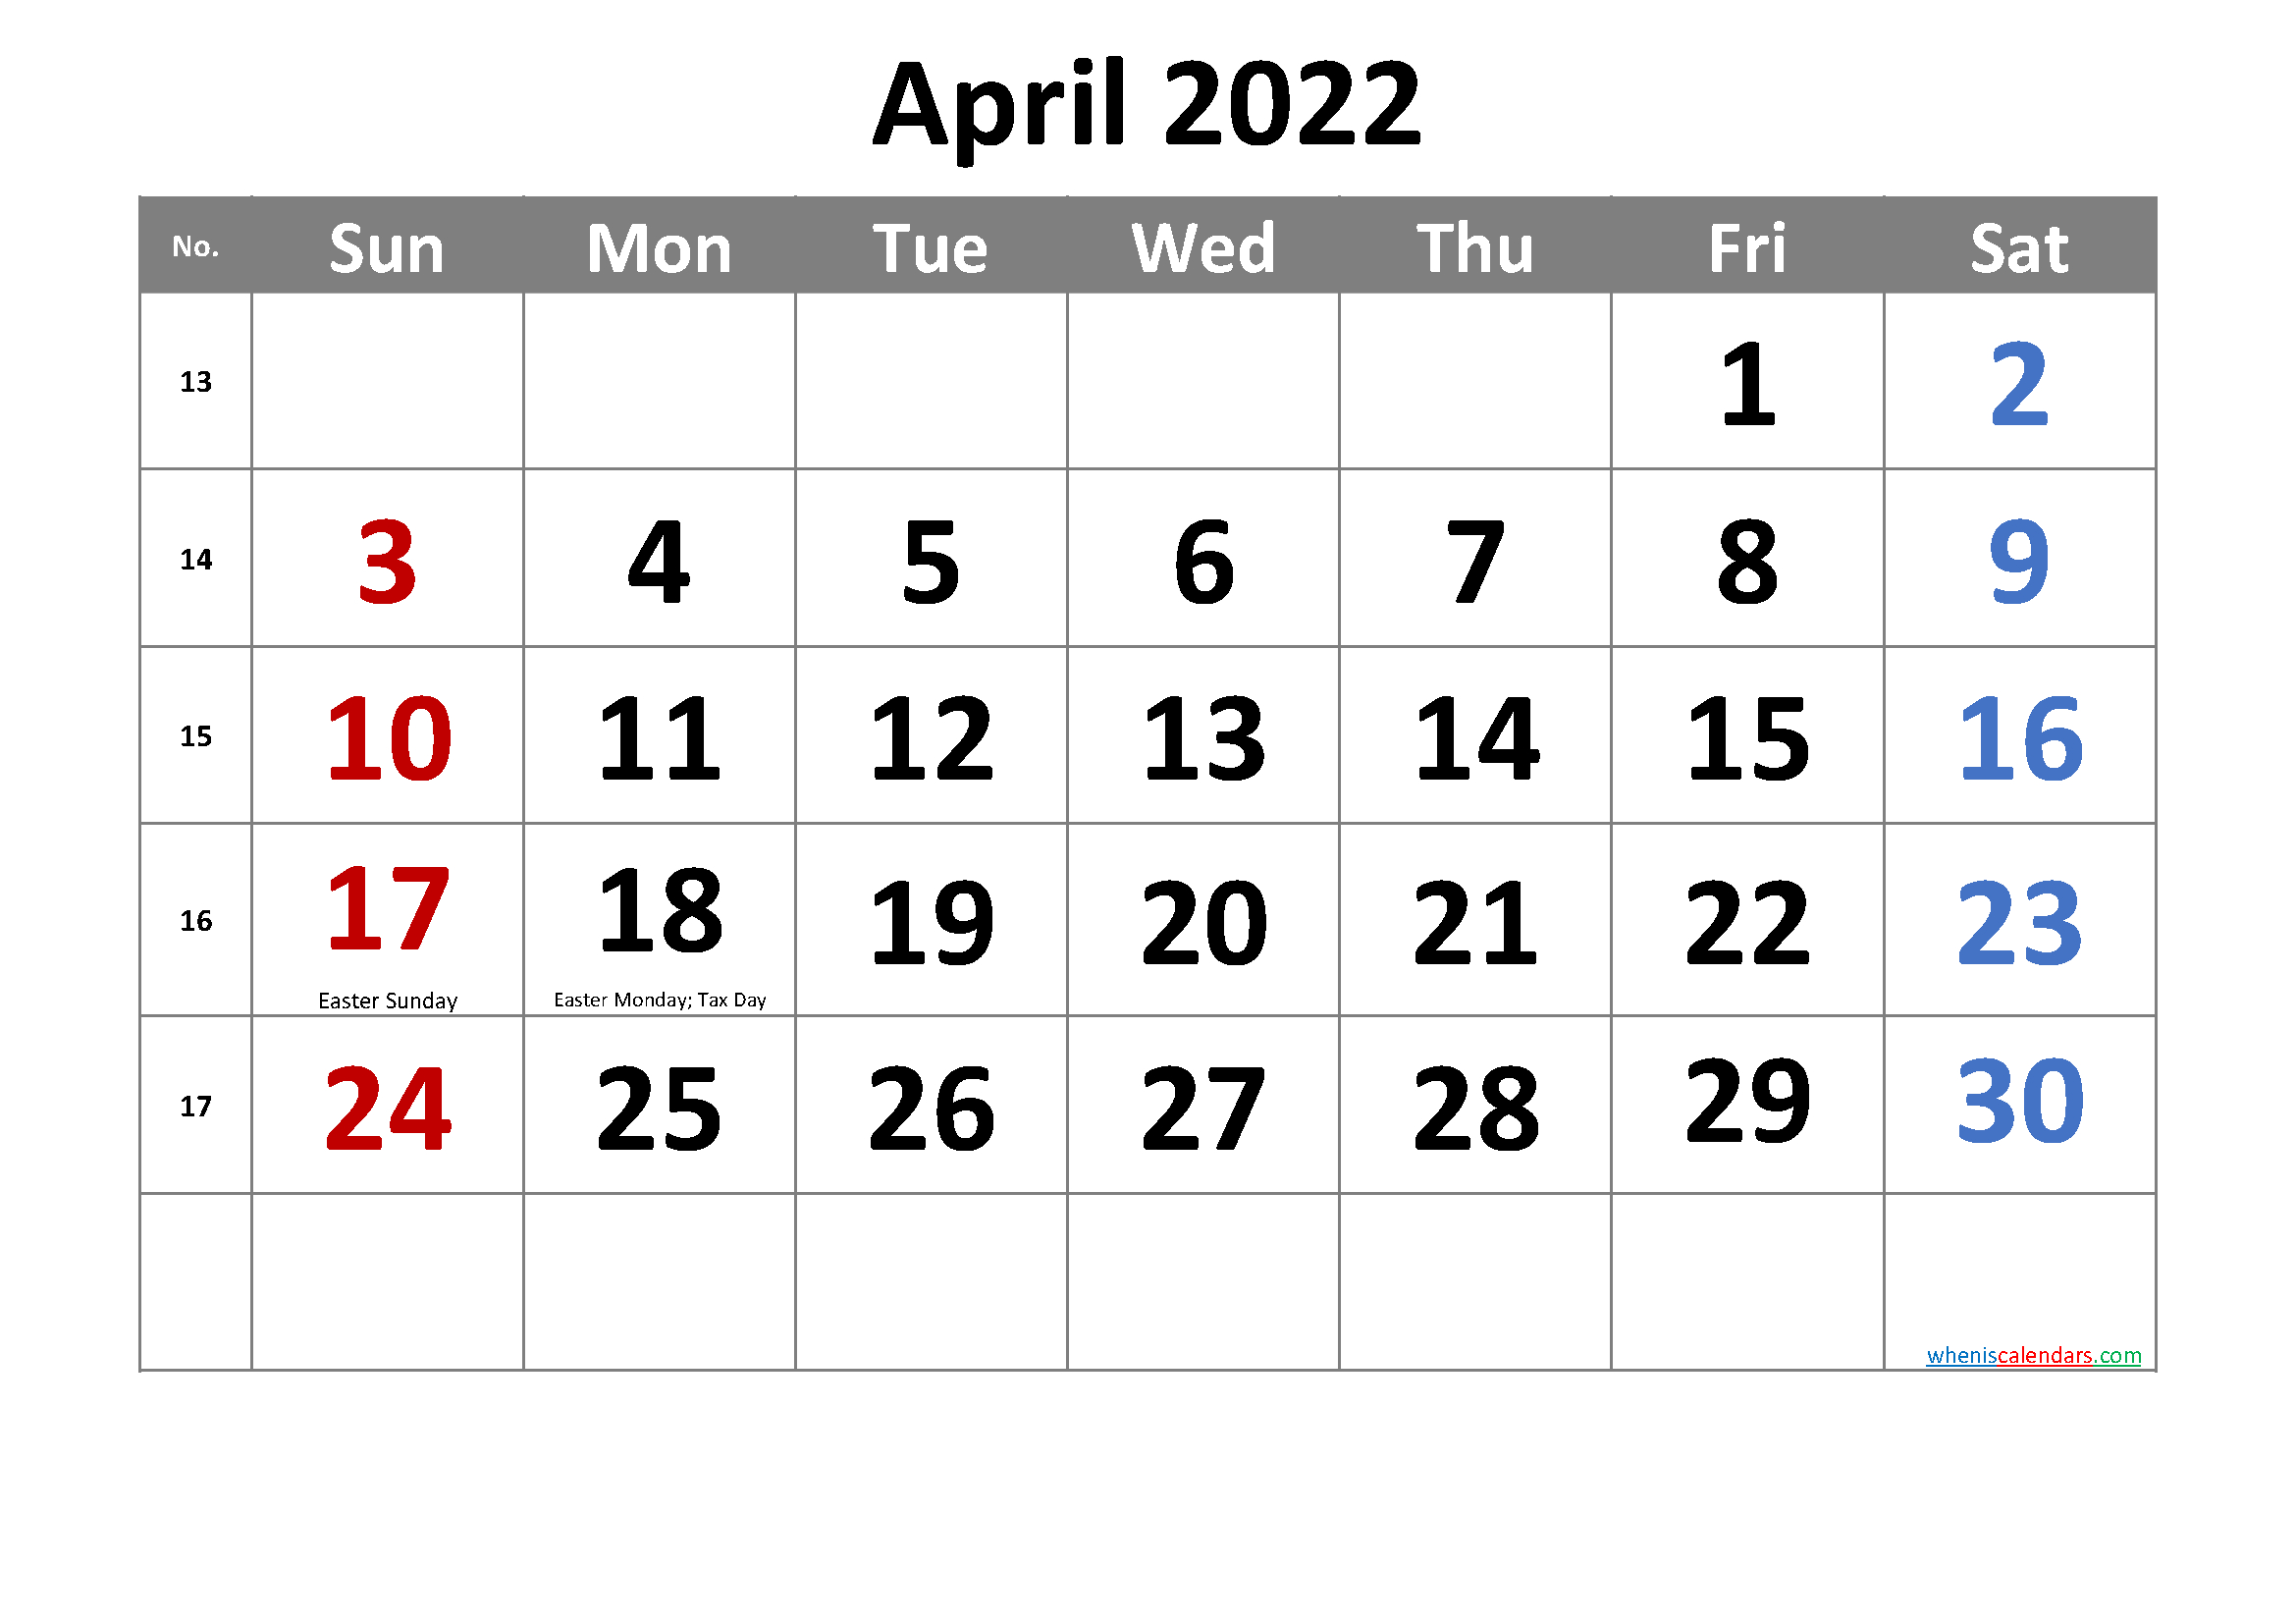 Free April 2022 Calendar Printable inside April 2022 Calendar Printable